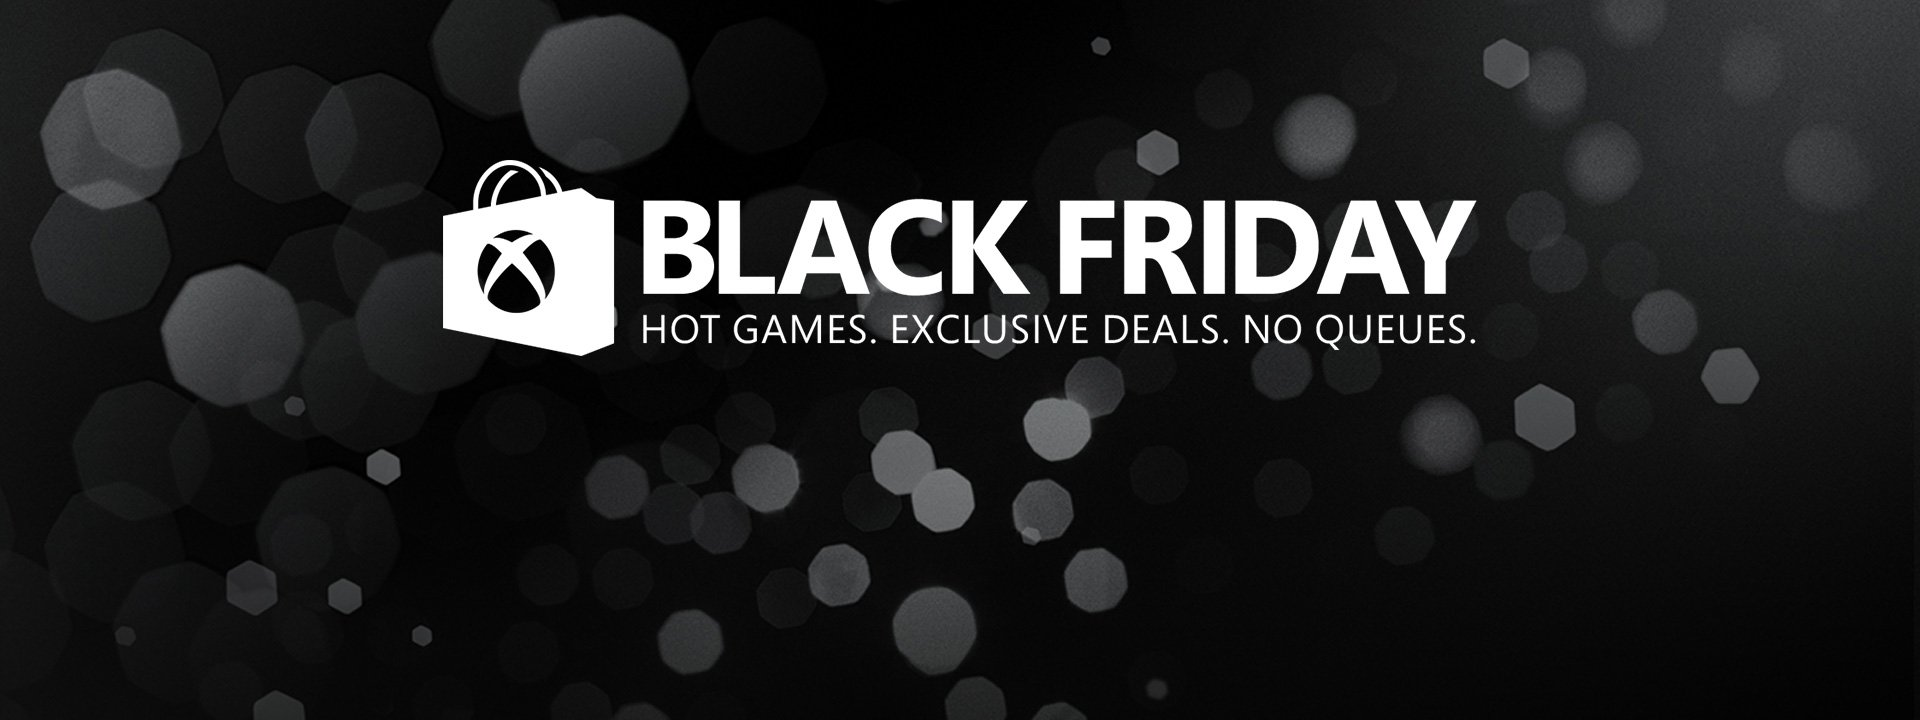 Black Friday Sale 2020 on Xbox!